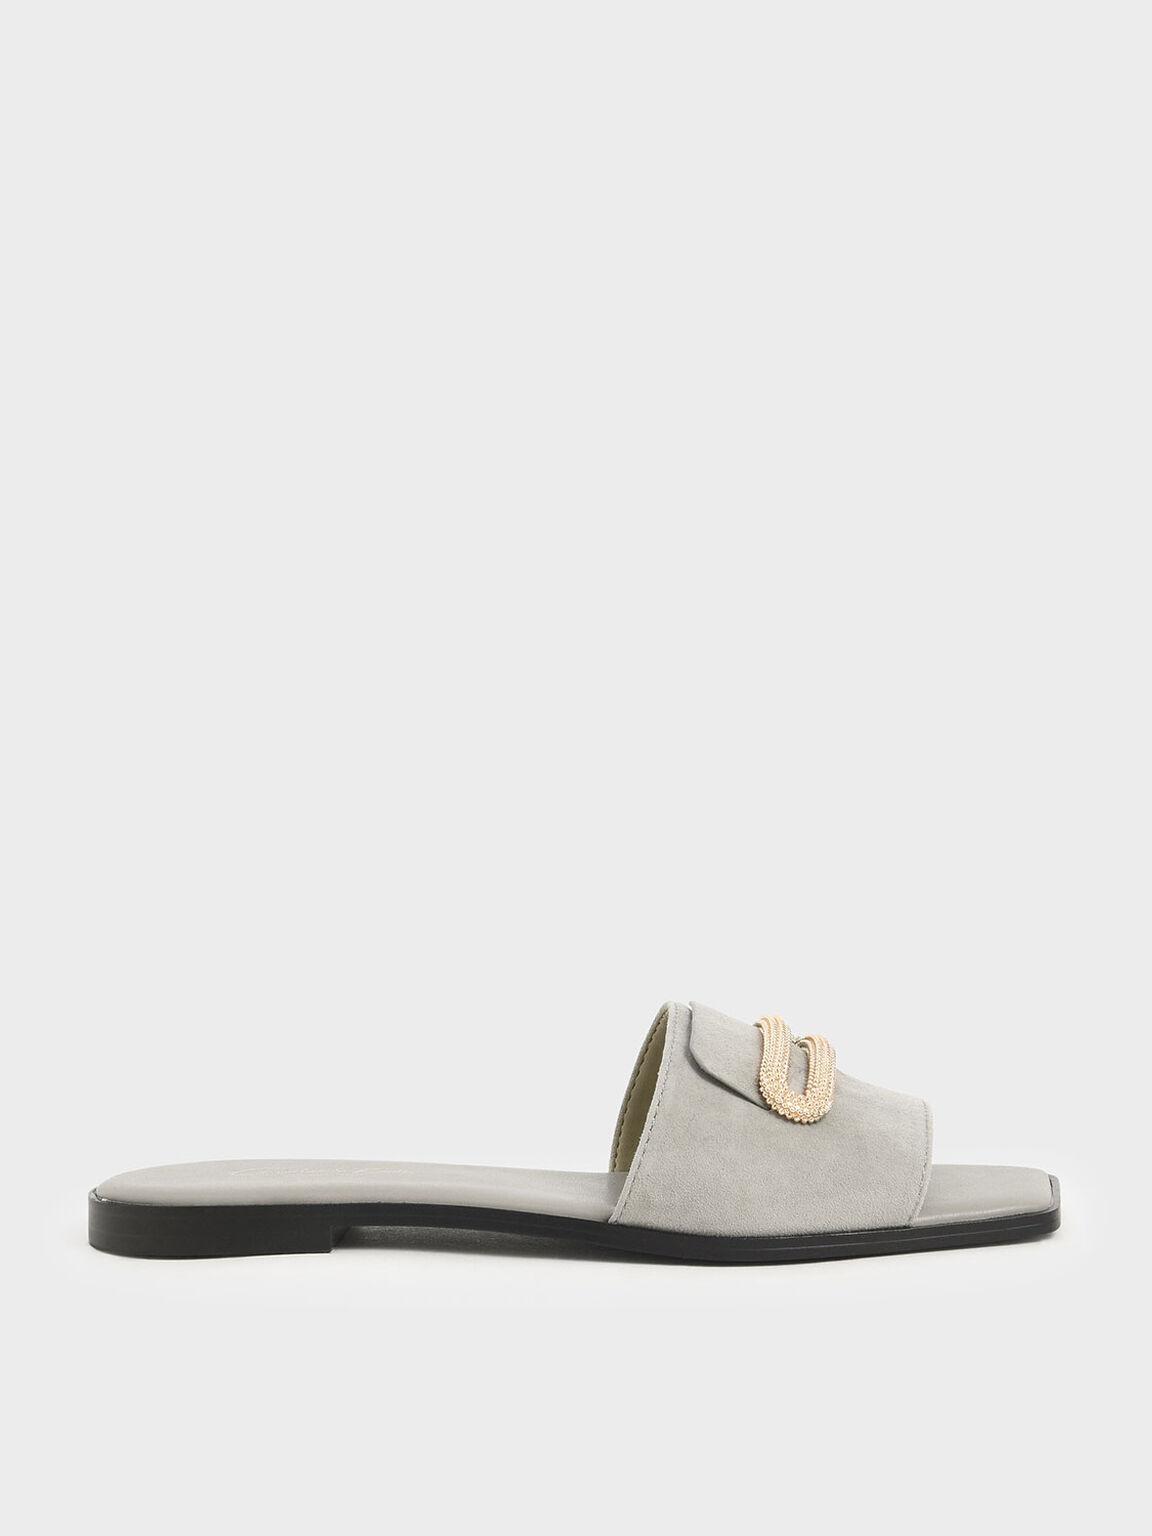 Metallic Accent Slide Sandals (Kid Suede), Sage Green, hi-res